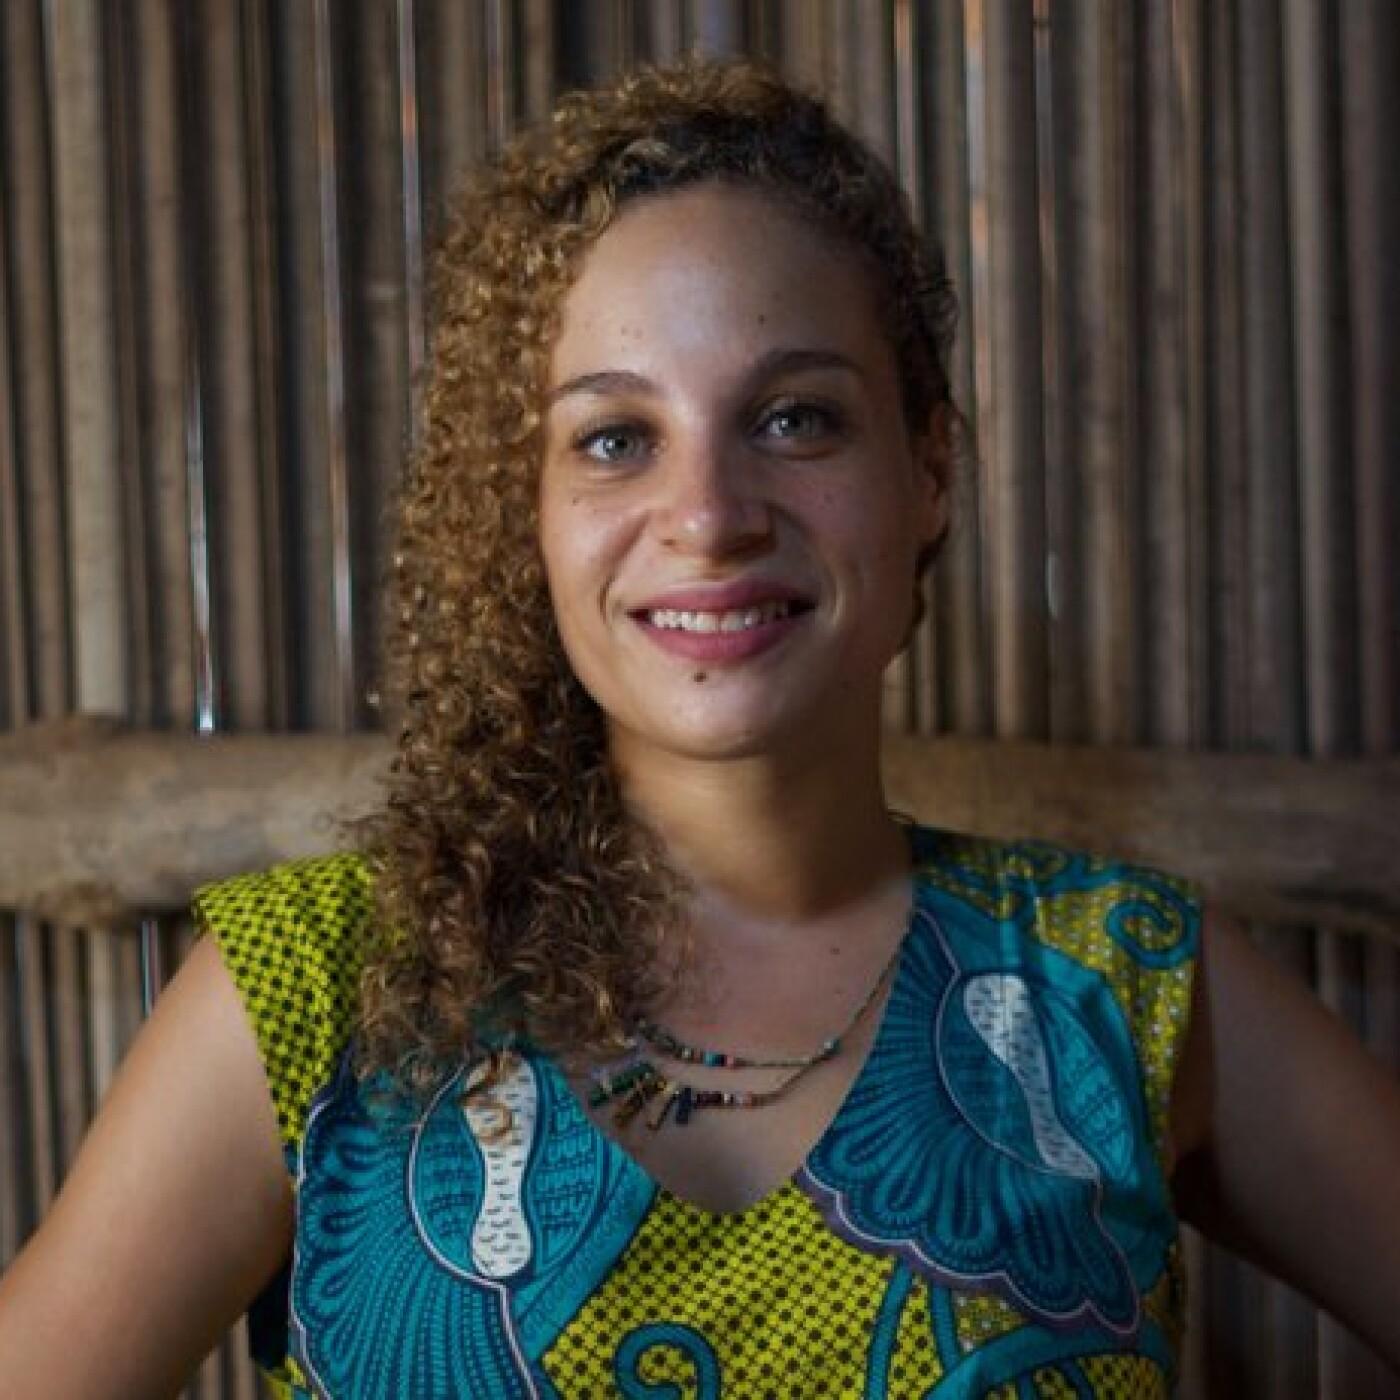 Naomi, Trophée Social & Humanitaire, présente son ONG - 18 06 2021 - StereoChic Radio